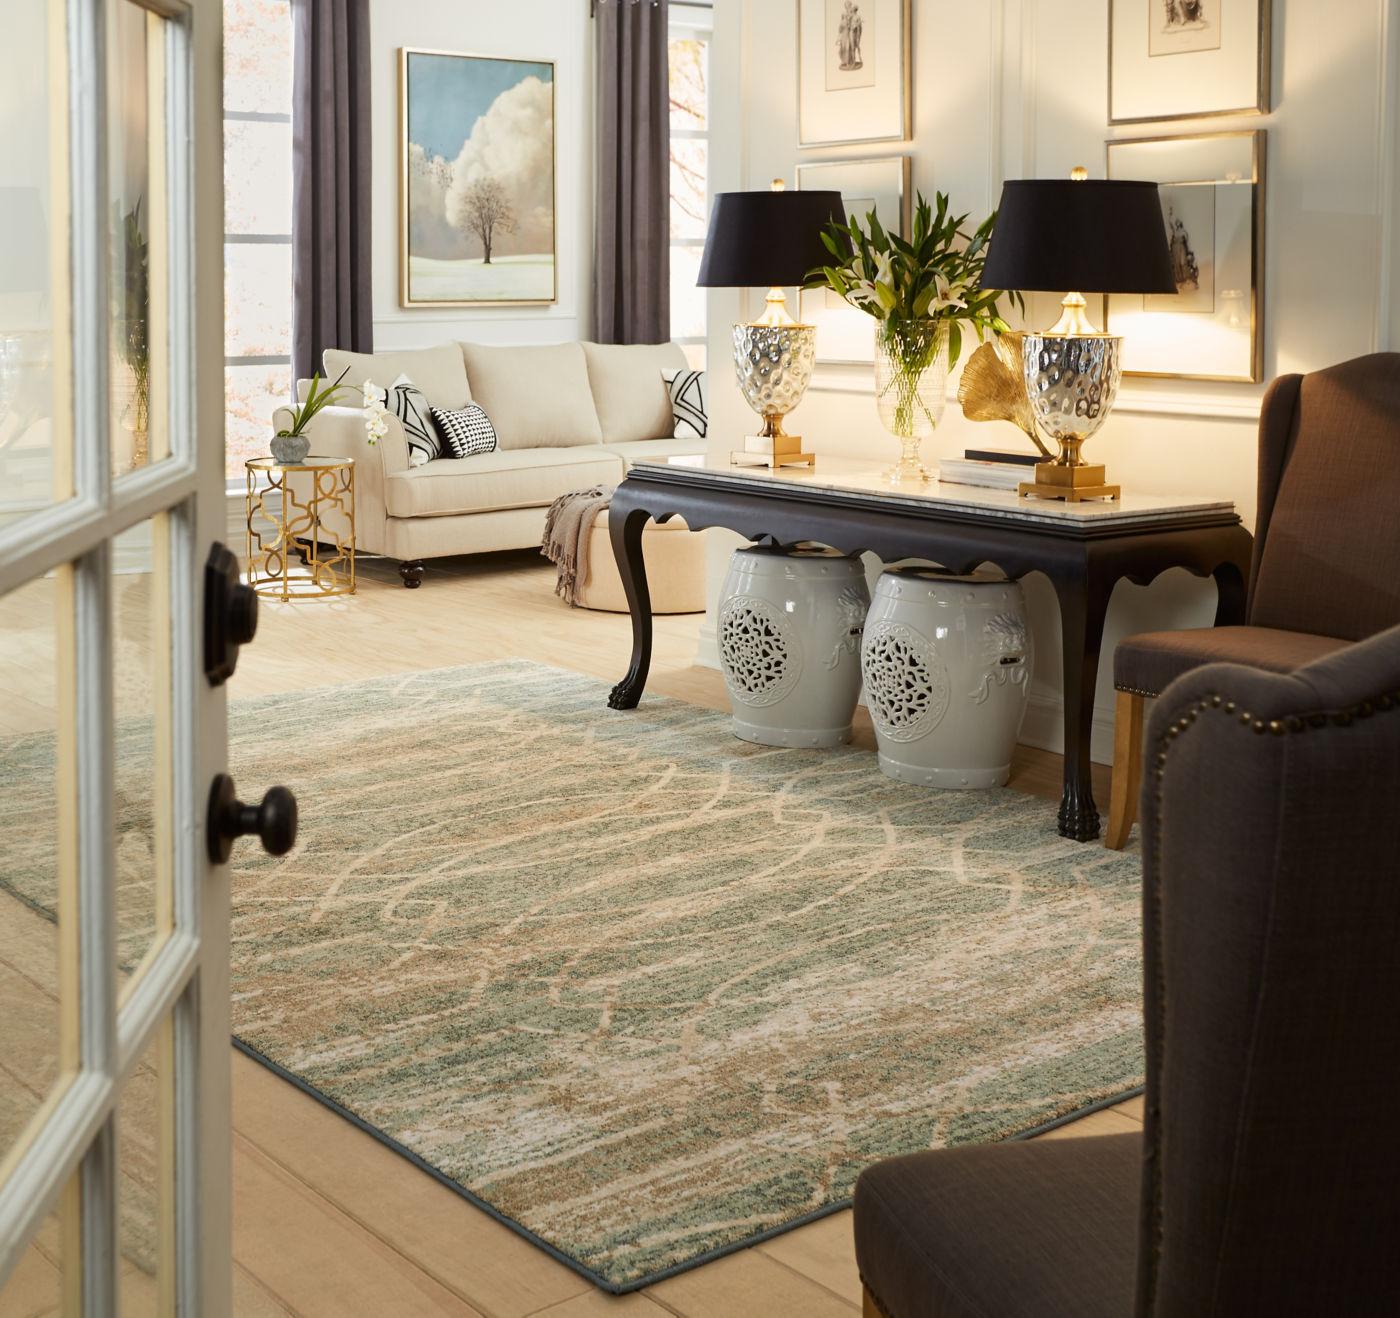 Area Rug in living room | Flooring 101